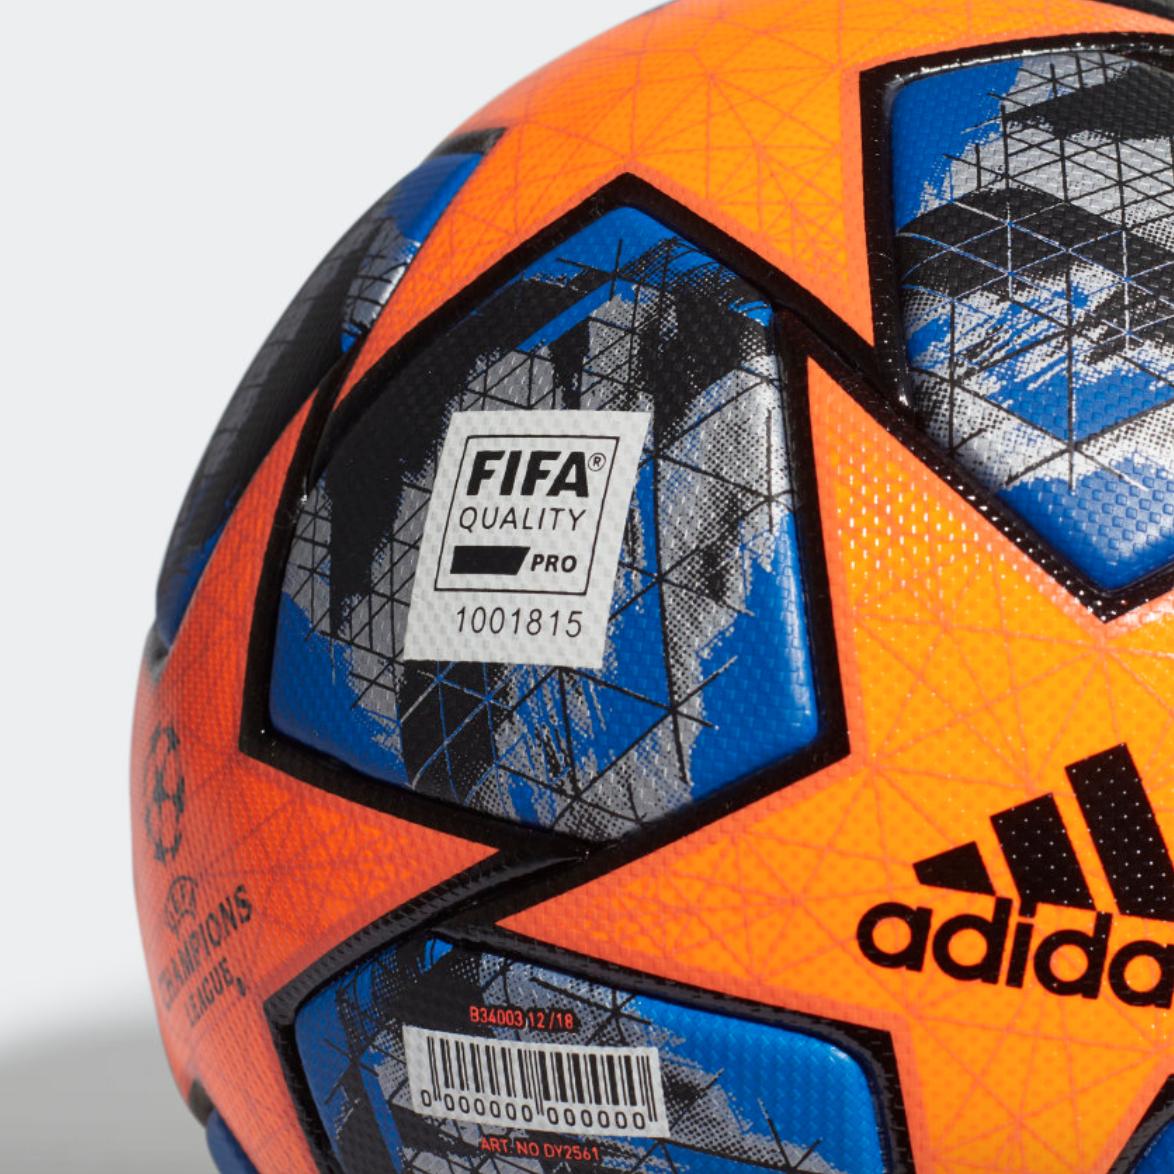 ballon-hiver-ligue-des-champions-2019-2020-adidas-3